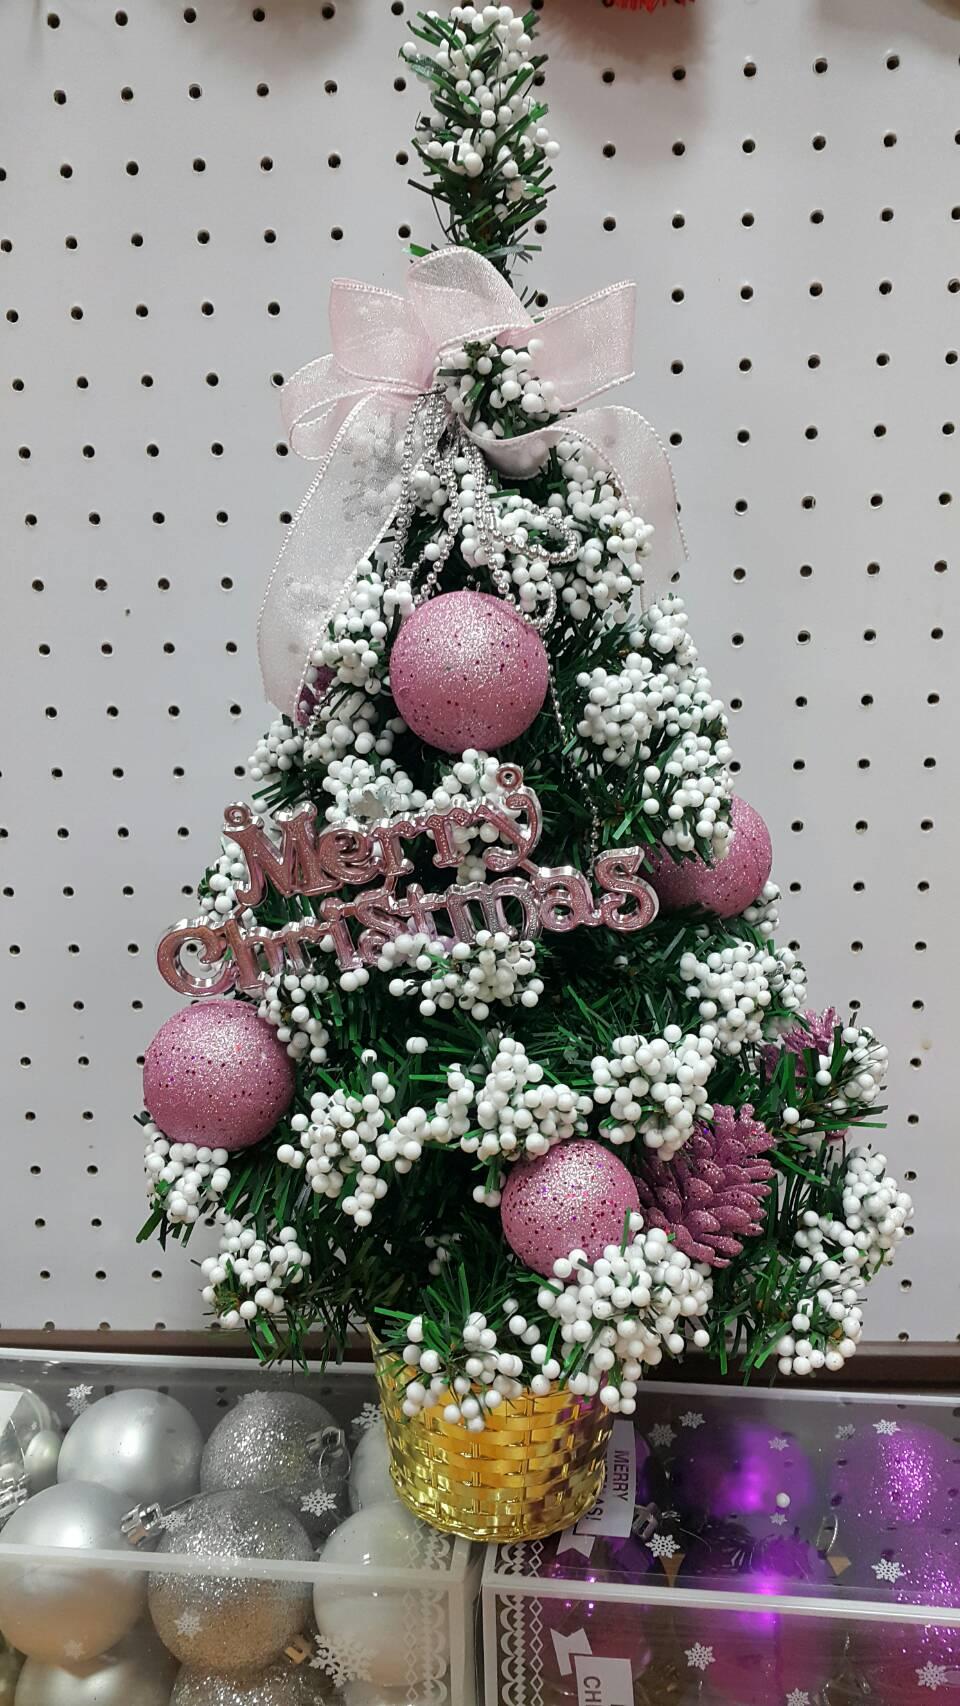 X射線【X392436】35cm雪花裝飾樹(紫),聖誕樹/聖誕佈置/聖誕燈/會場佈置/材料包/成品樹/小樹